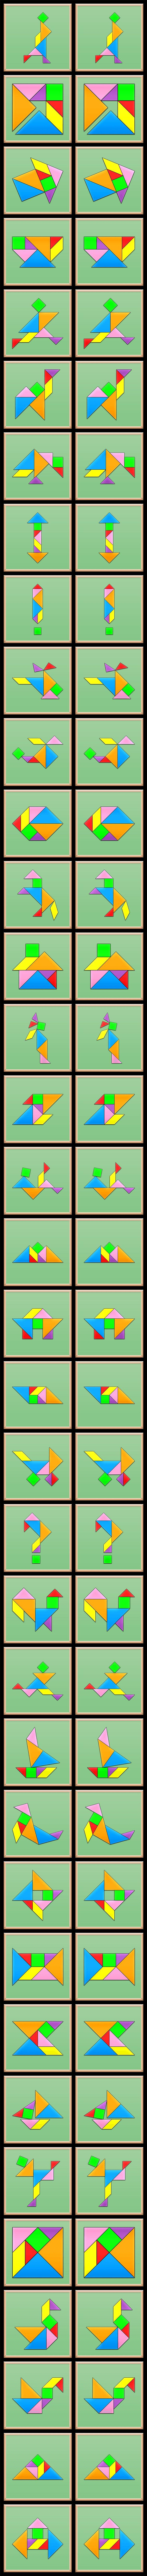 Tangram Memory Cards - Free Printables! - http://www.tangram-channel.com/tangram-memory/